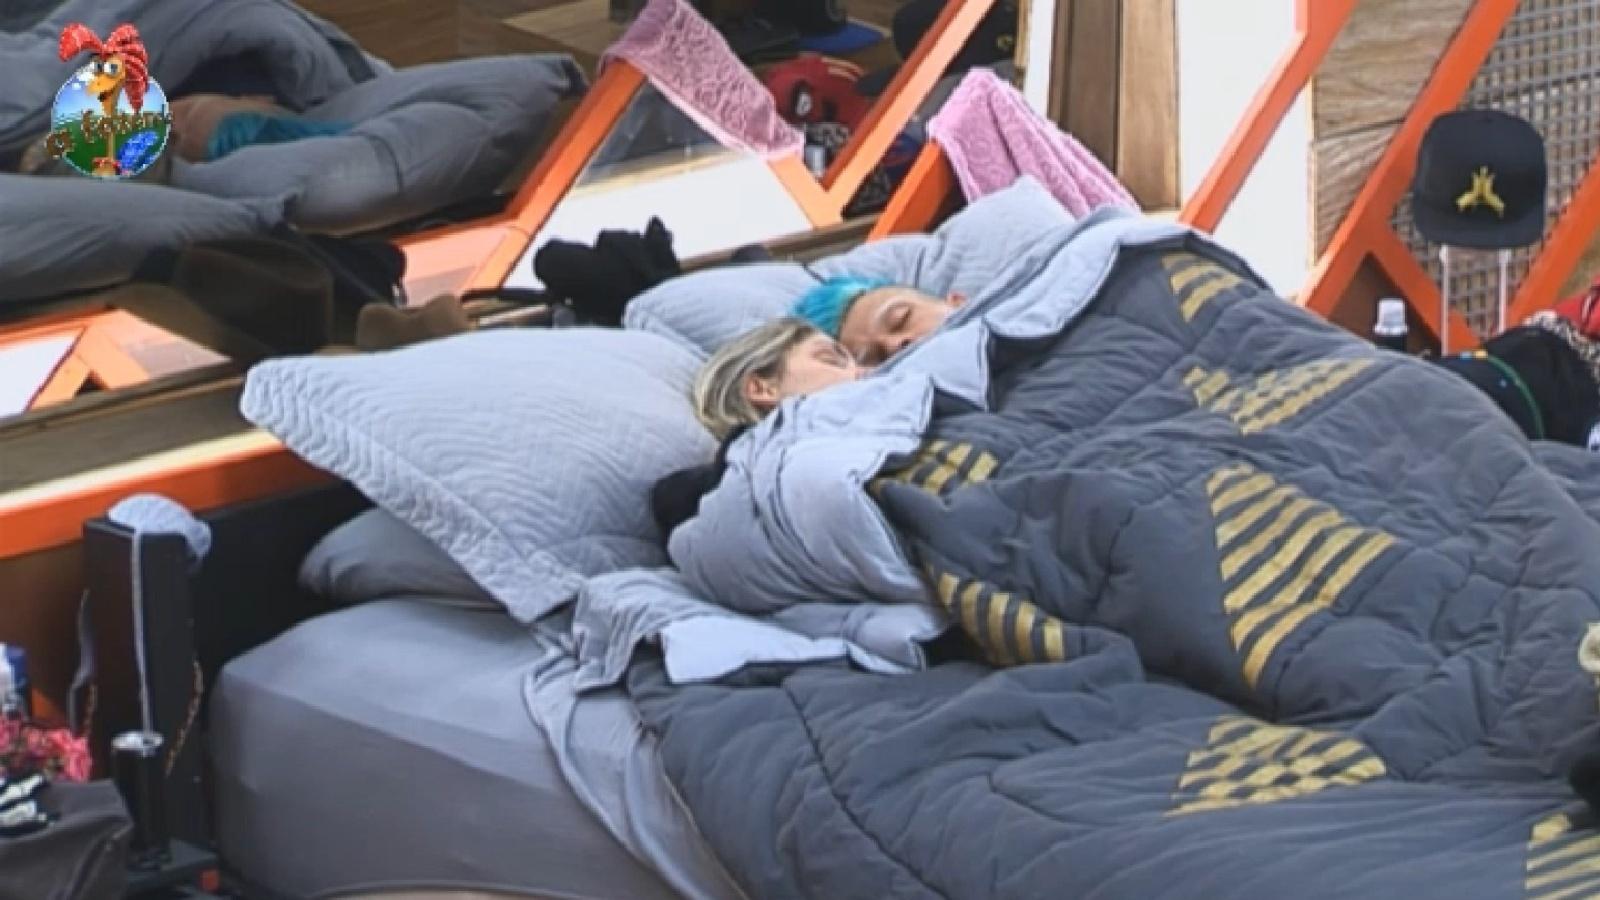 13.ago.2013 - O casal Bárbara e Mateus dorme na tarde desta terça-feira